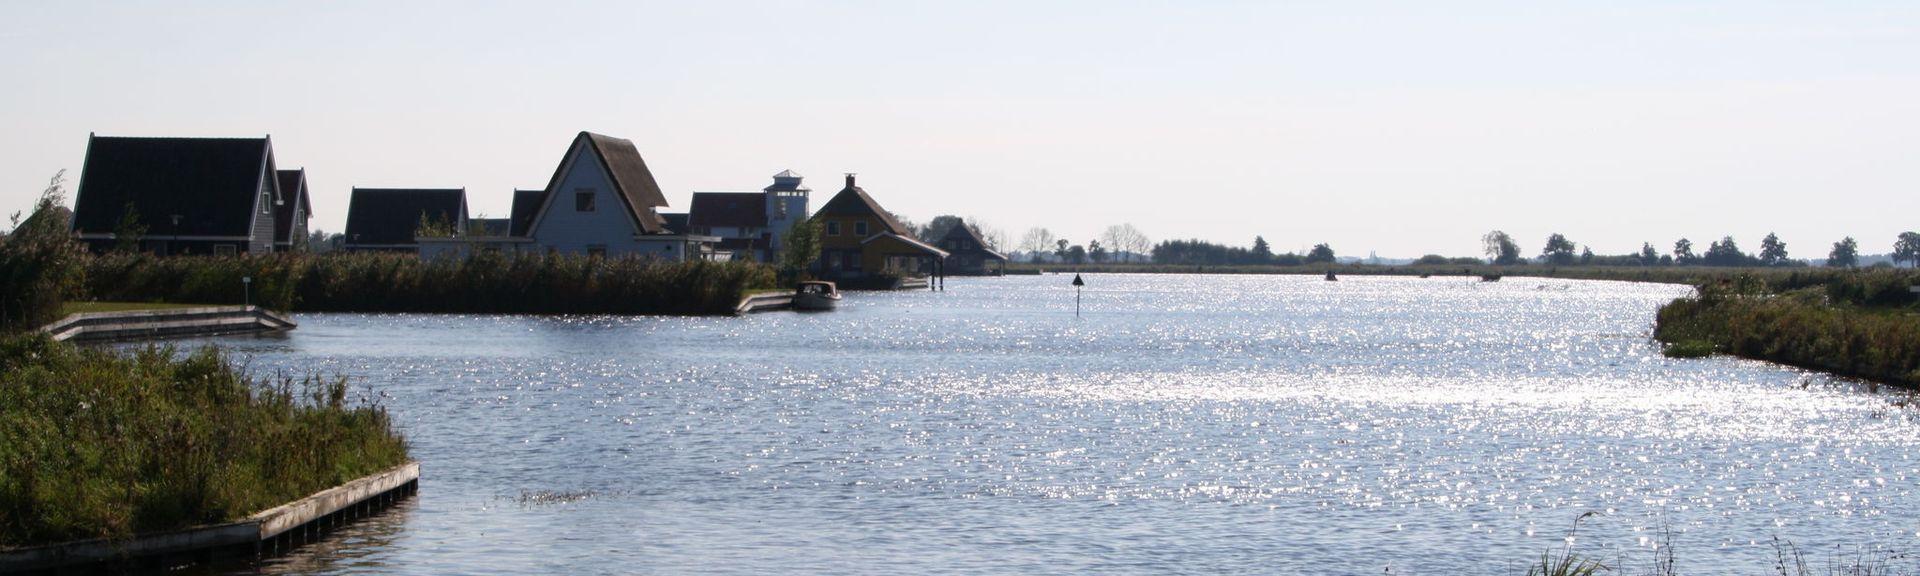 Nederland, Overijssel, Pays-Bas